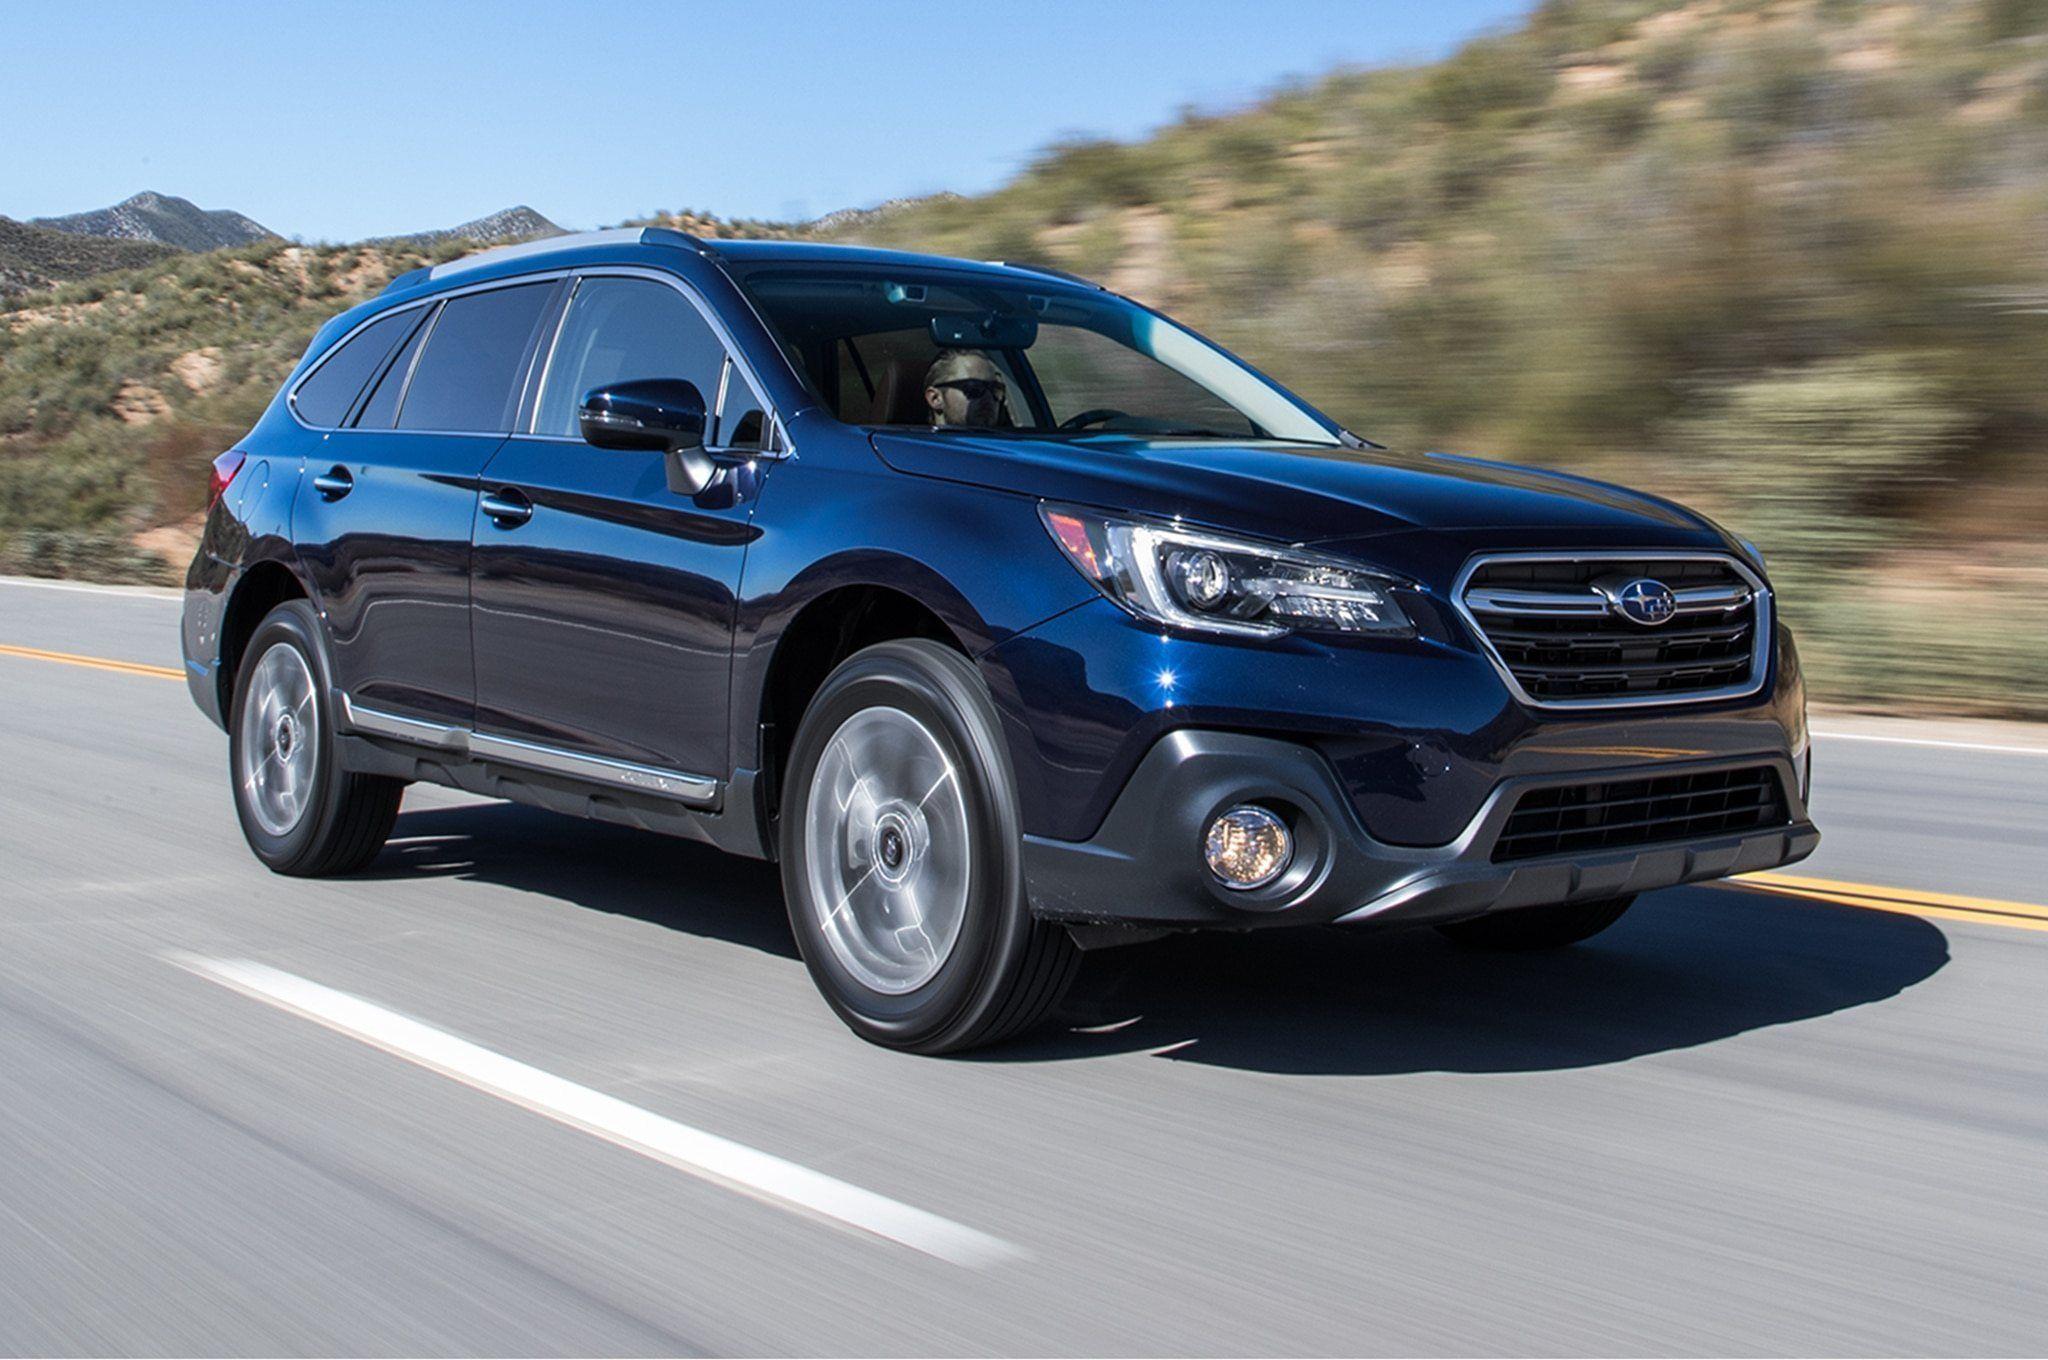 2020 Subaru Outback Turbo Hybrid Rumors In 2020 Subaru Outback Subaru Outback